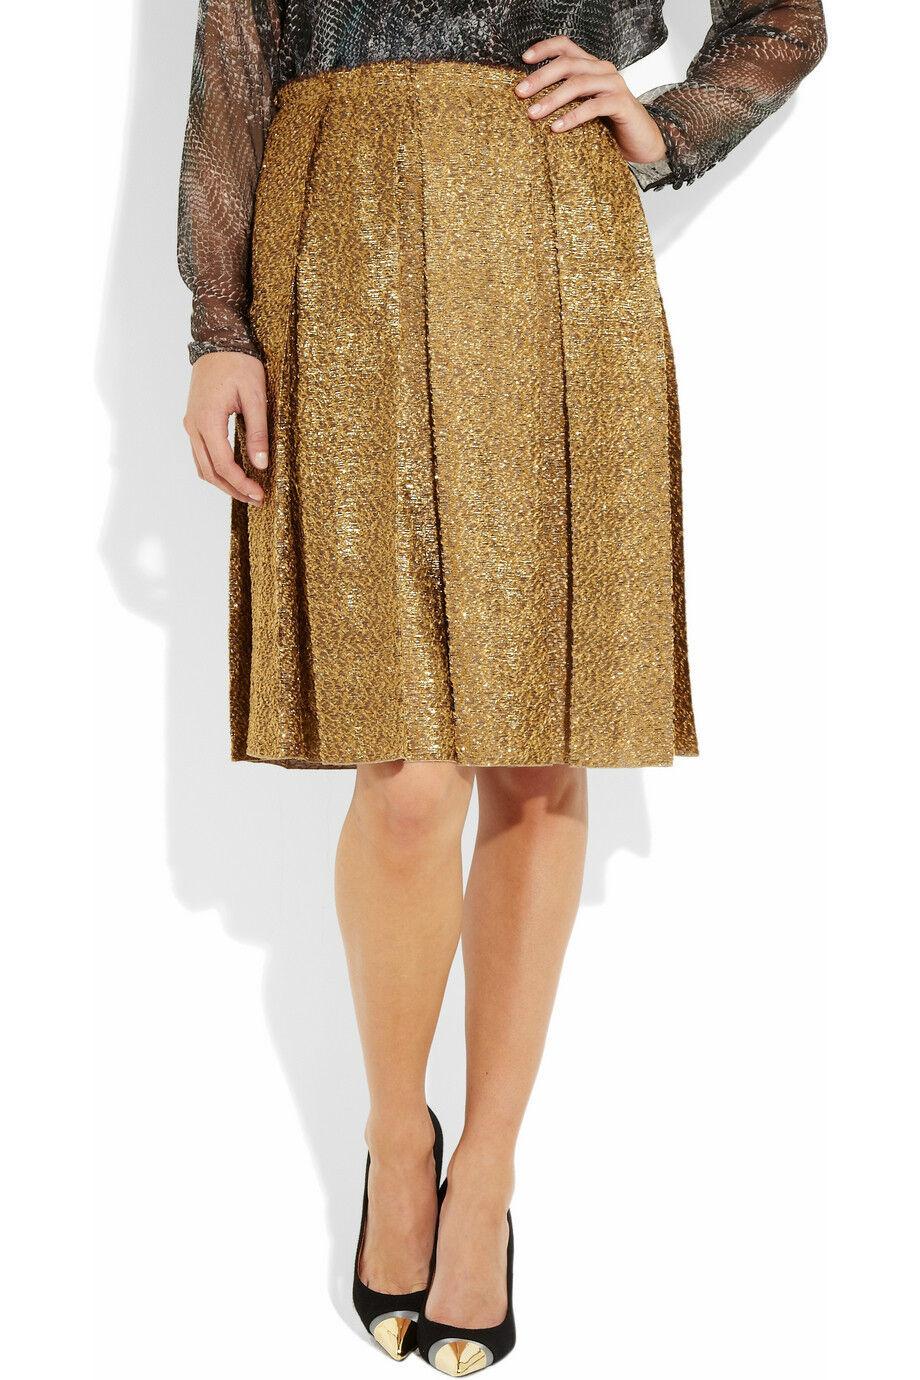 1,990 NWT LANVIN Bronze Metallic Tweed Pleated Rock FR36 US4